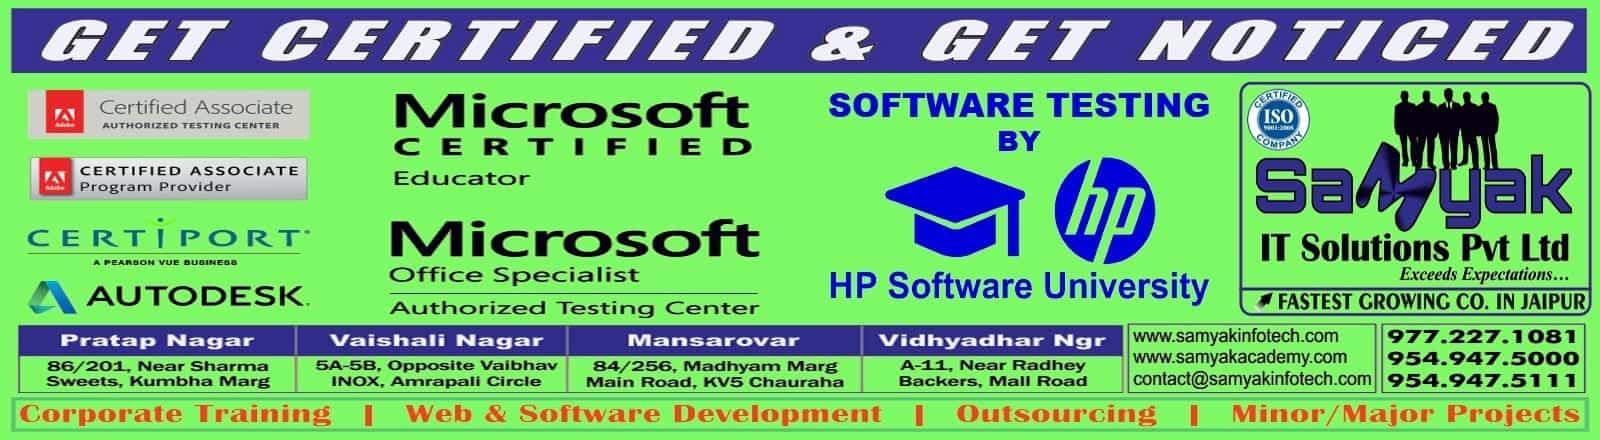 Certification Exams In Jaipur Rajasthan Adobe Hp Redhat